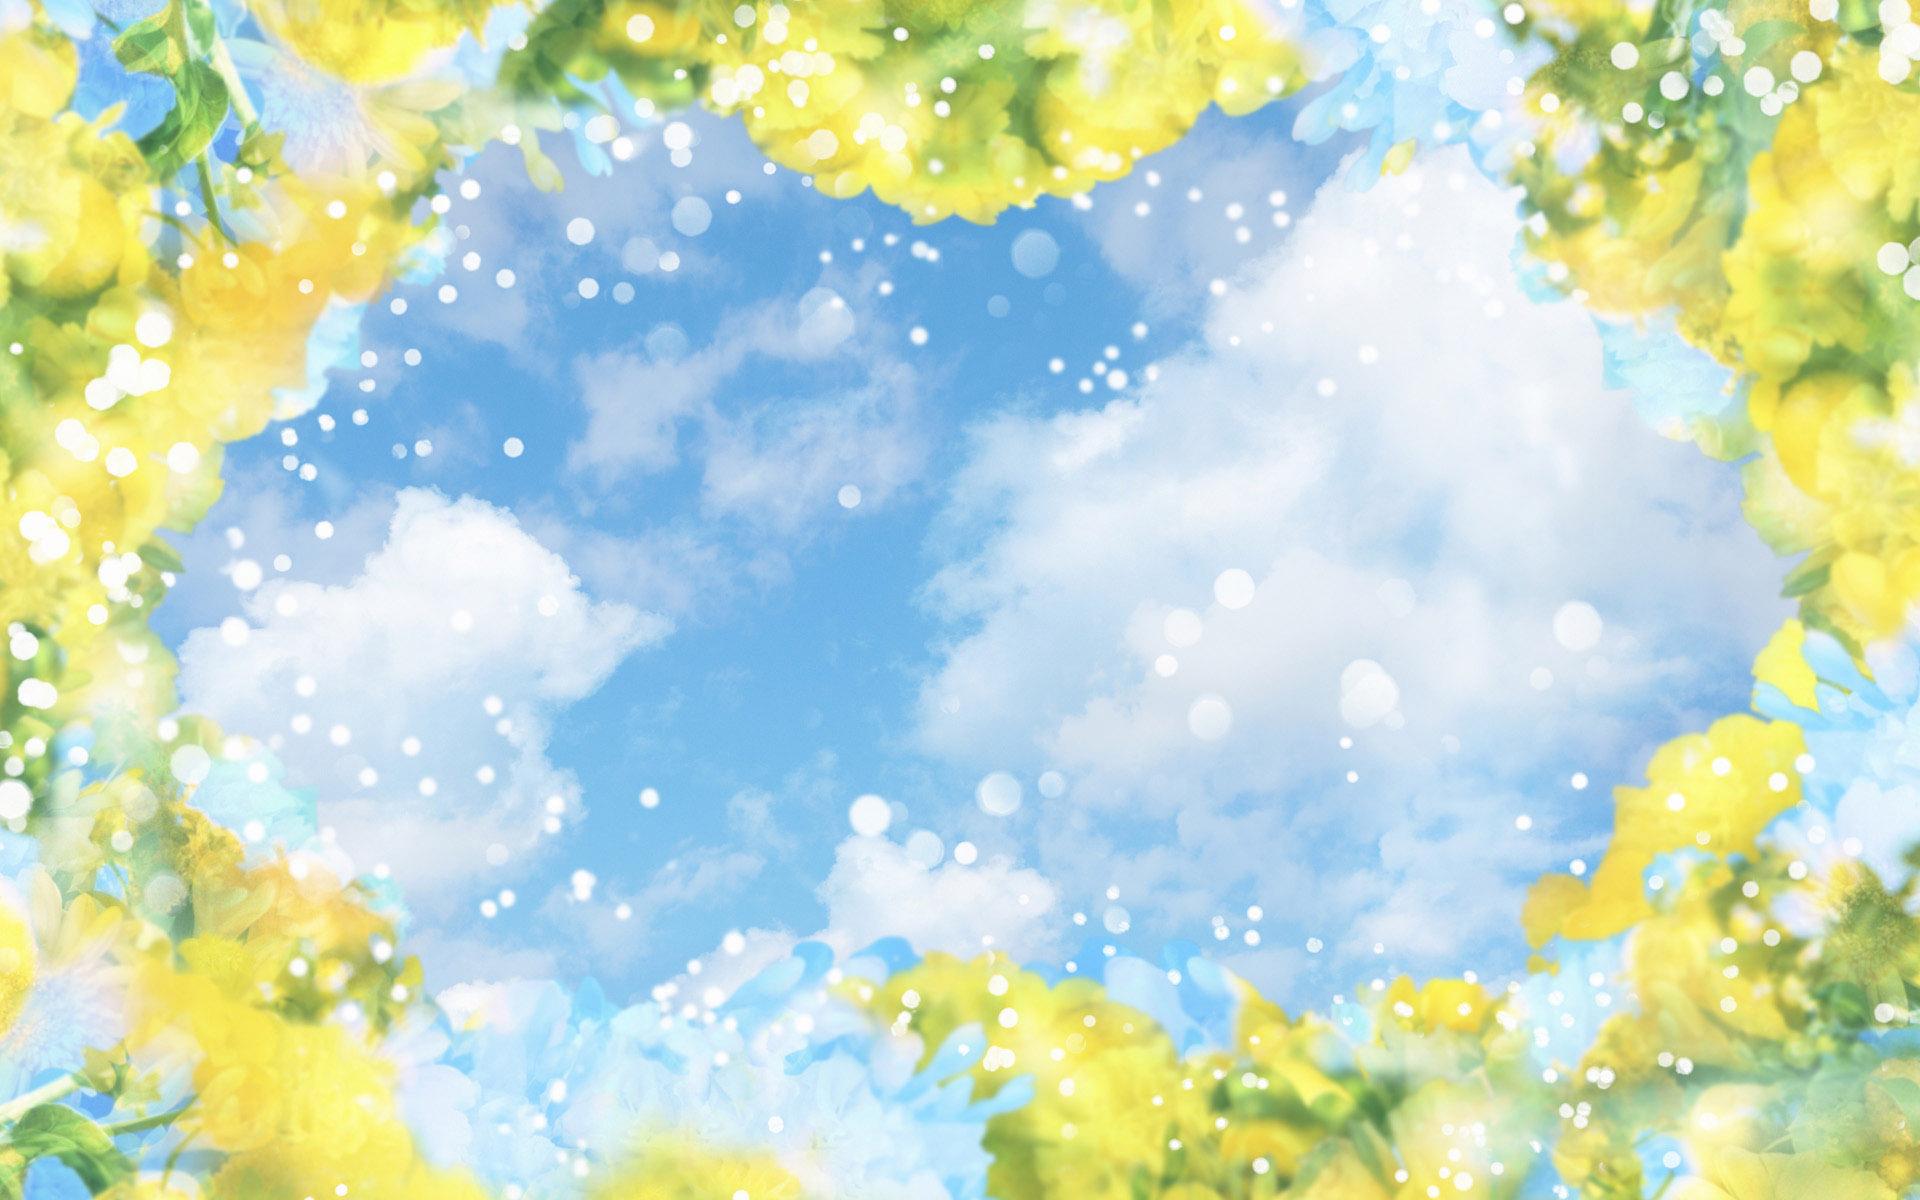 Flower Backgrounds